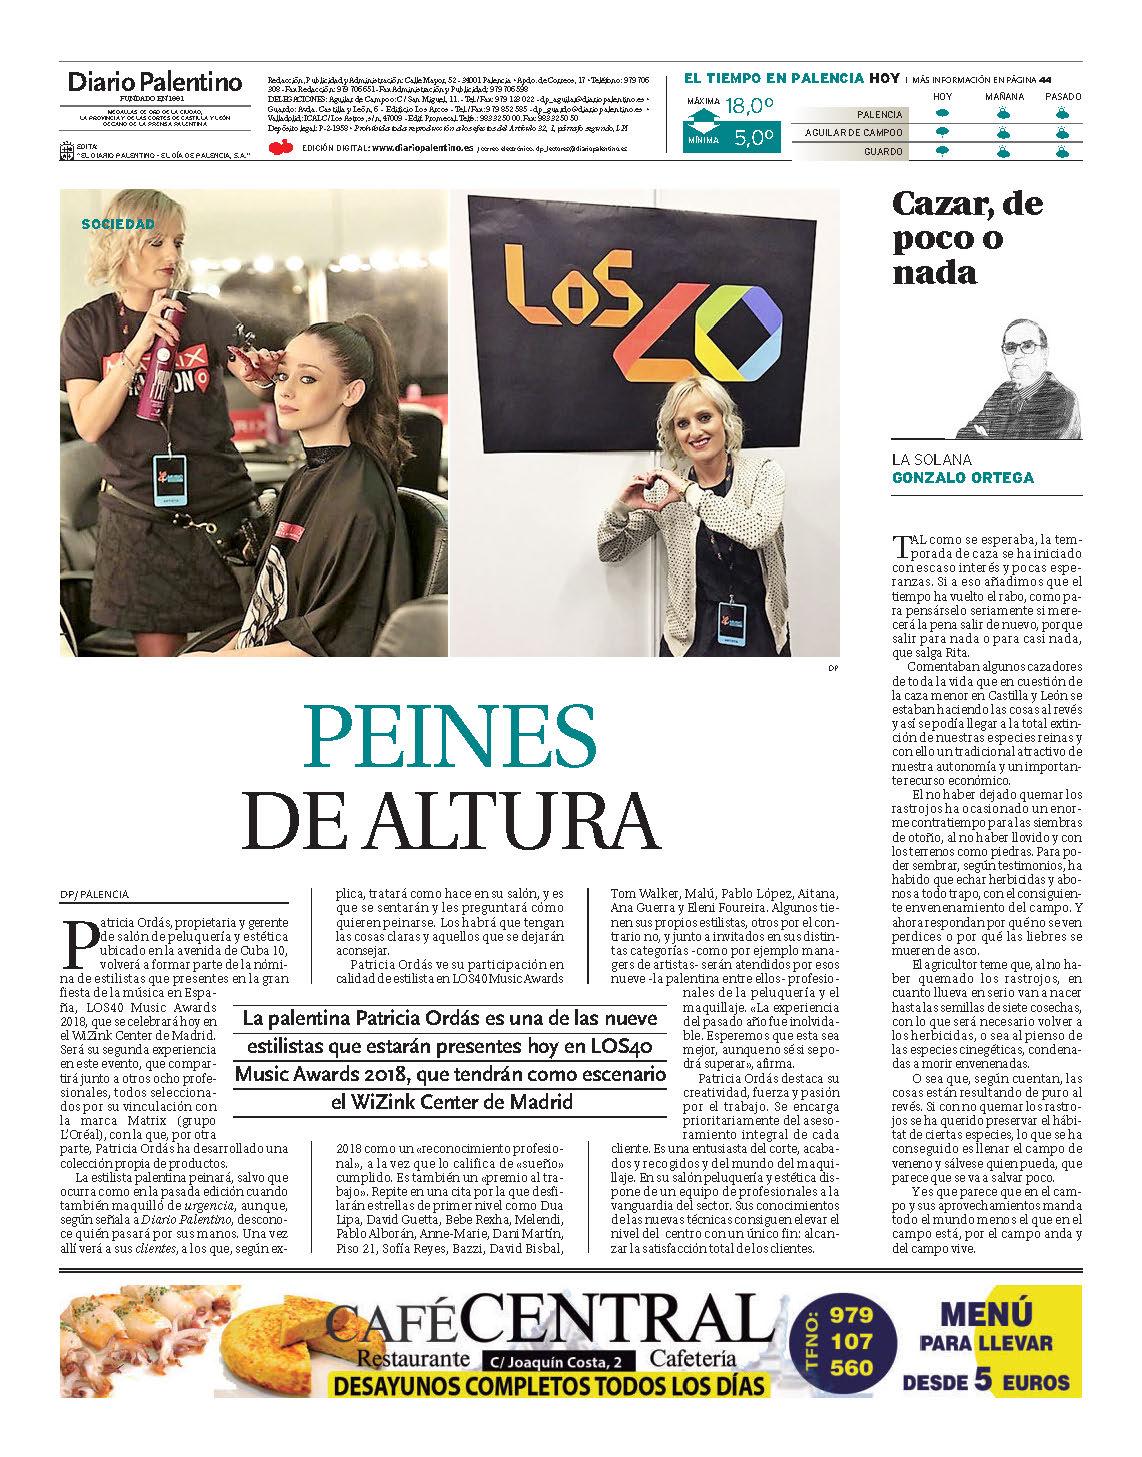 DIARIO_PALENTINO_02-11-18_PG048